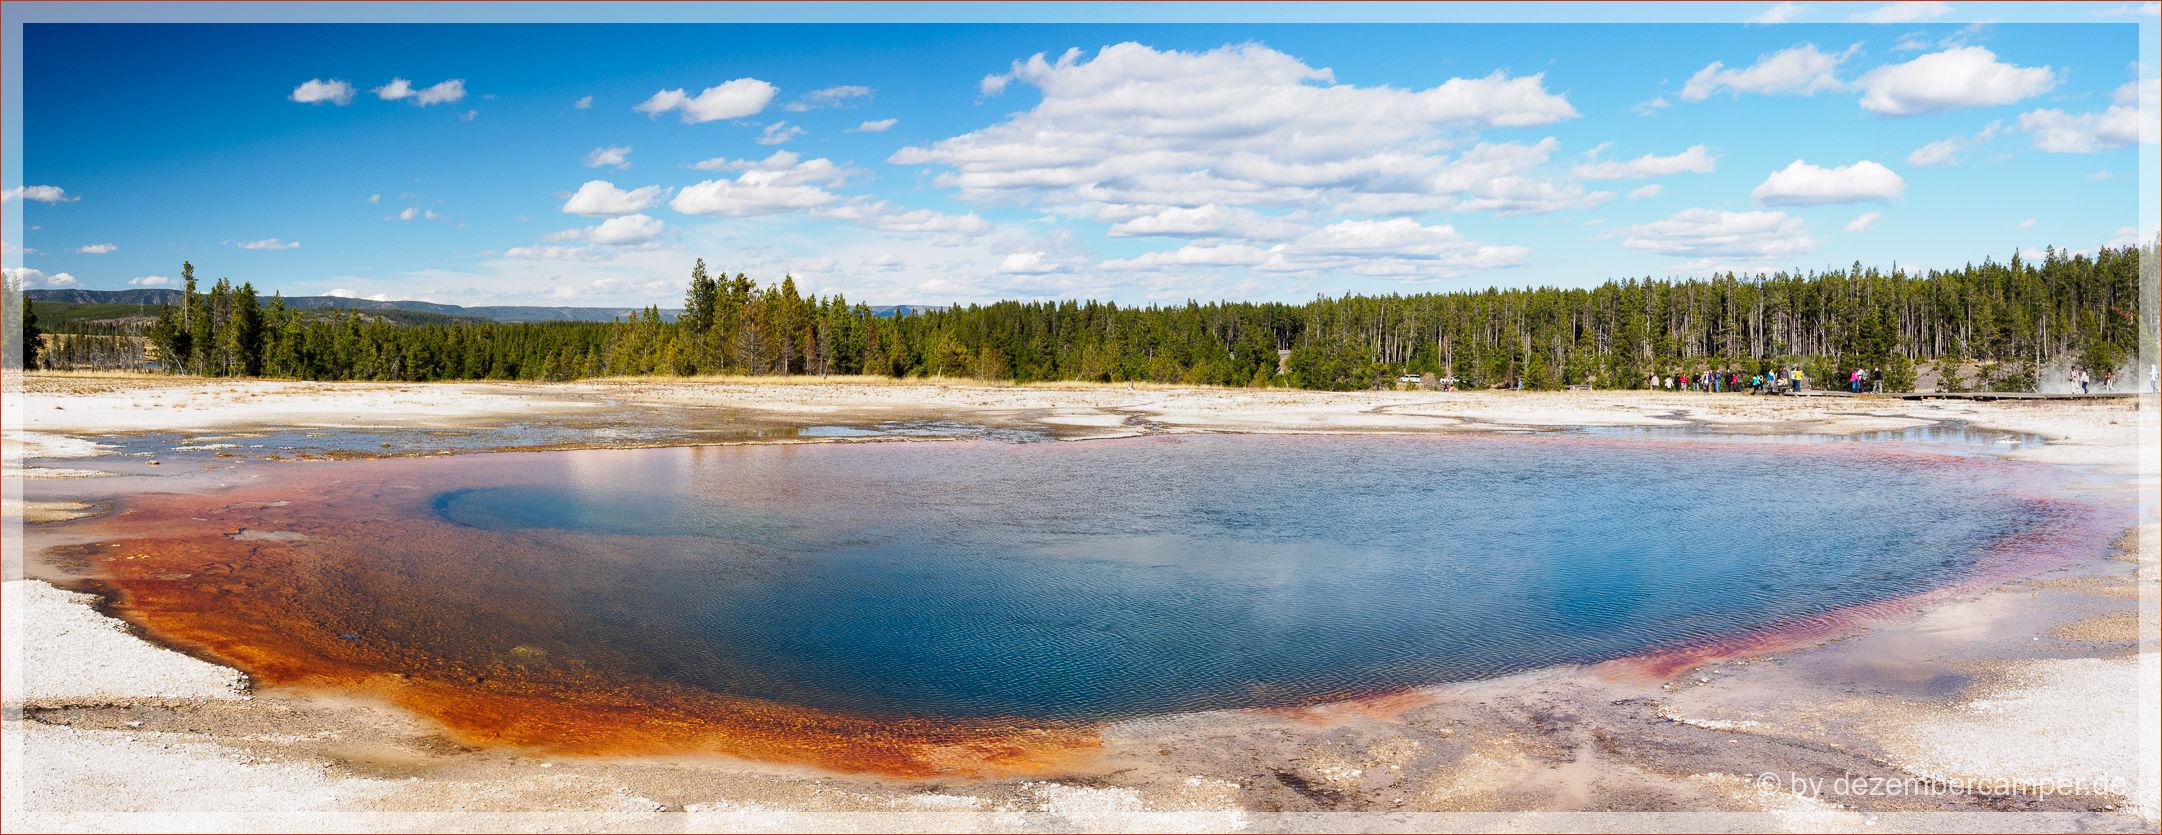 Yellowstone NP - Midway Geysir Basin - Turquoise Pool